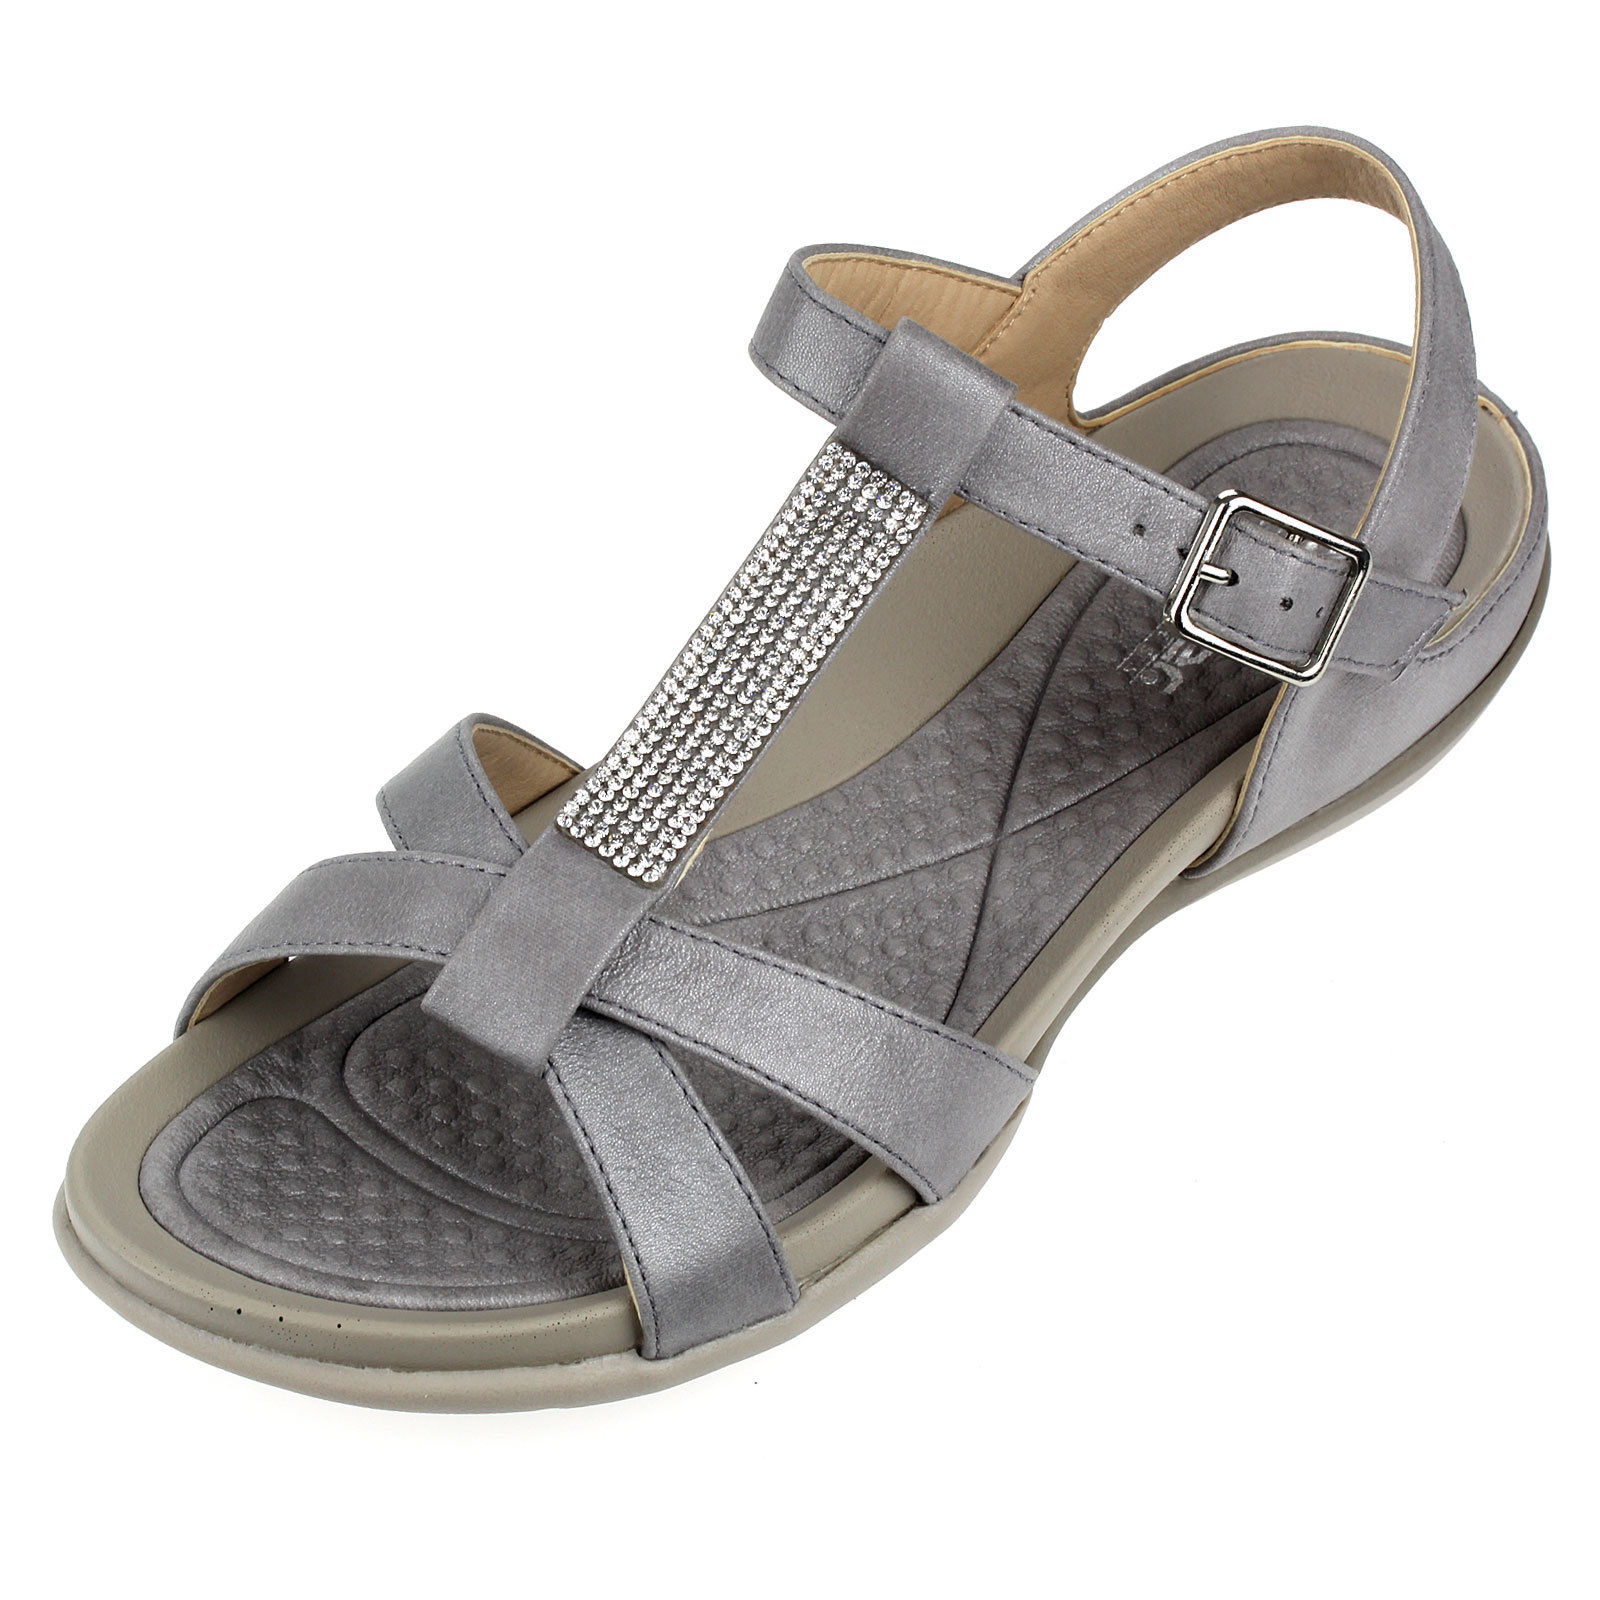 Details zu Rieker Damenschuhe Sandalen Freizeit Sommer Schuhe V9463 42